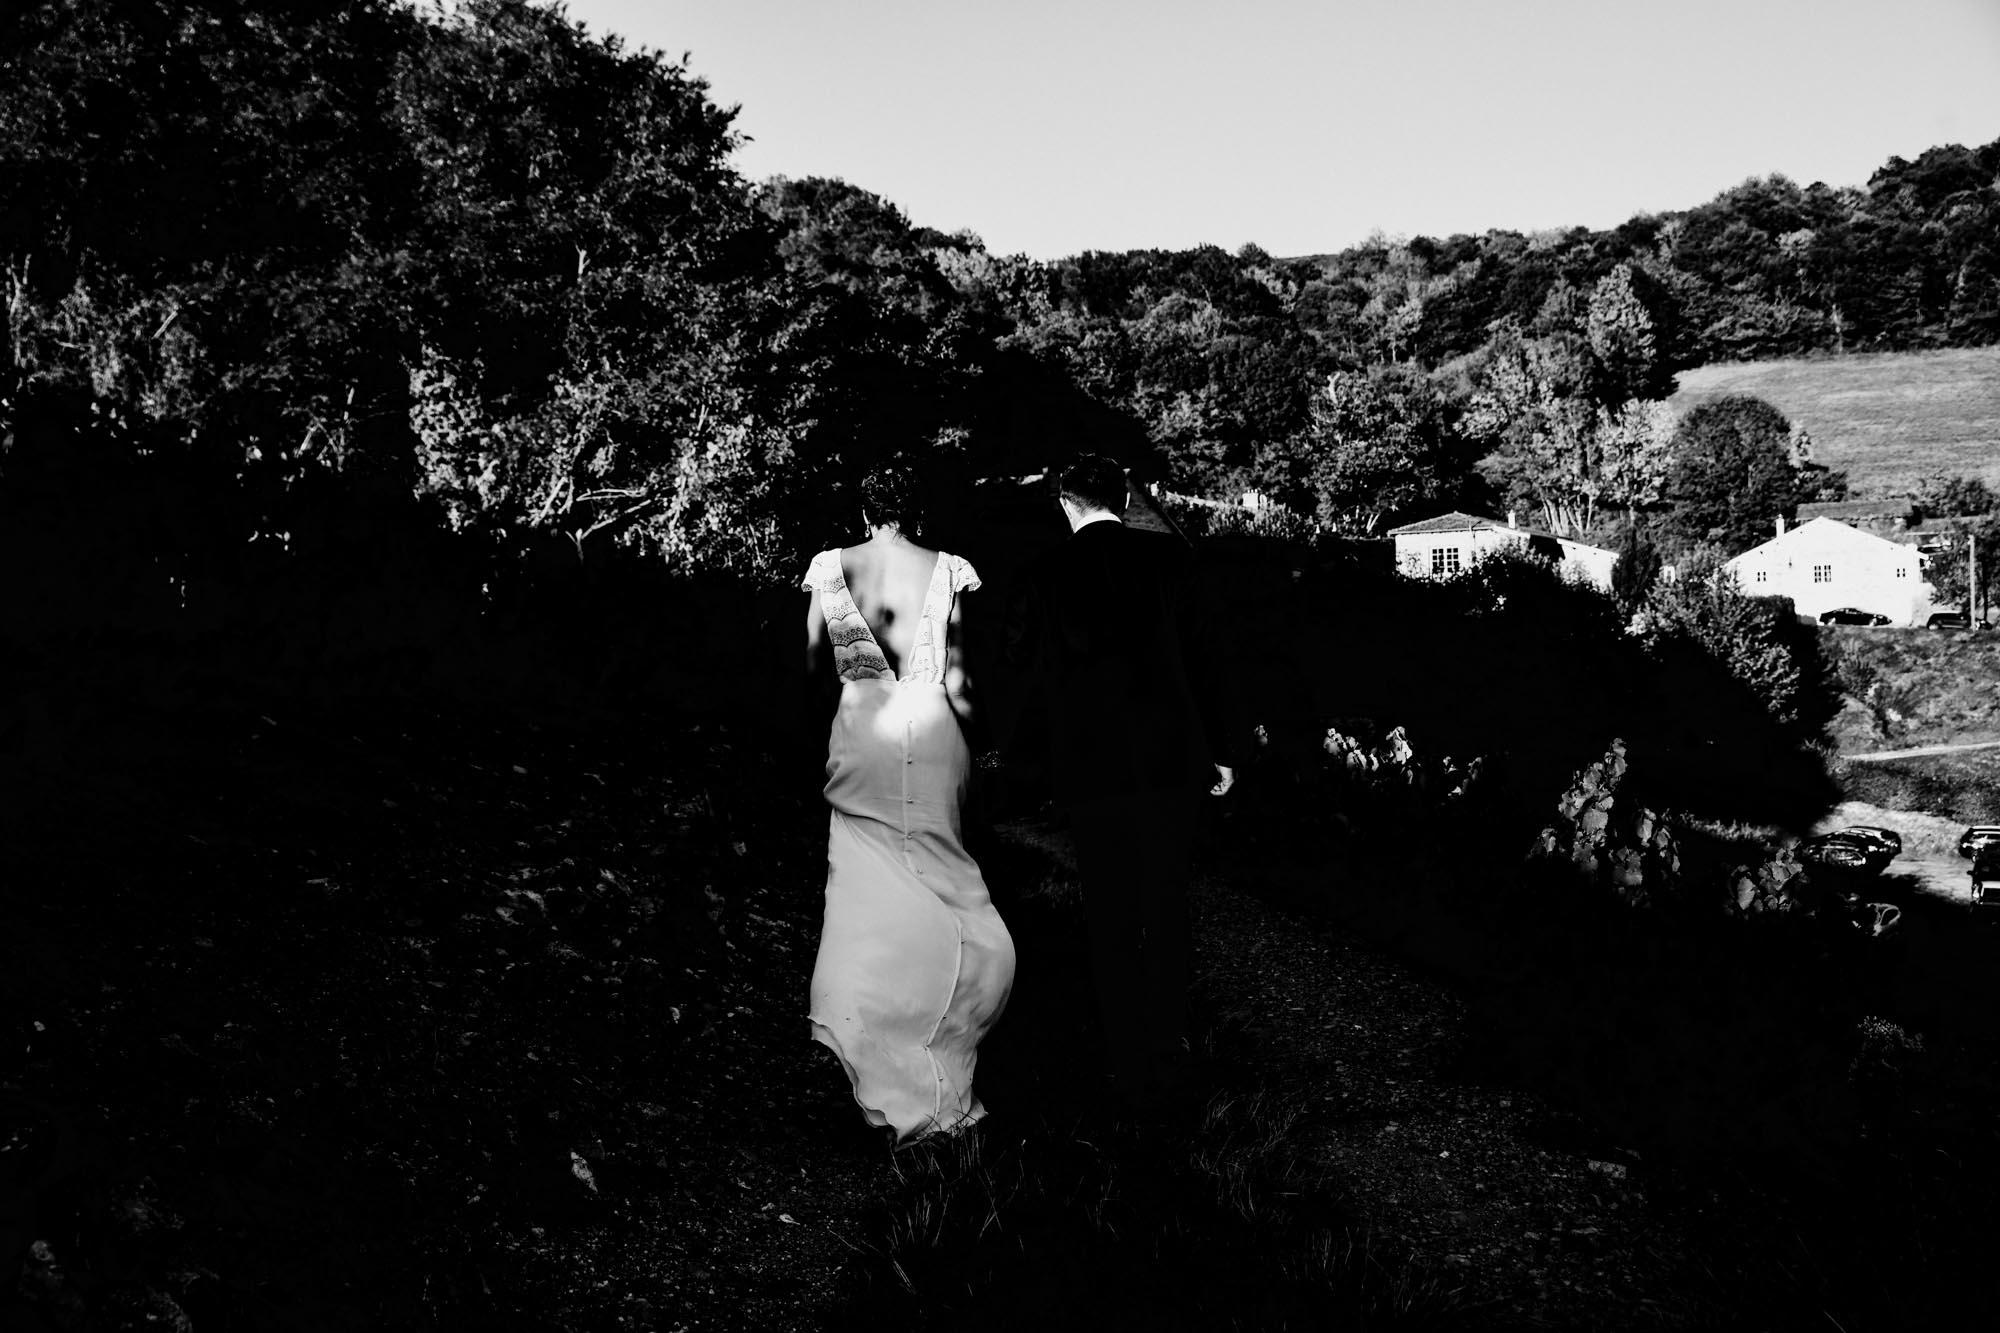 2018-09-08 - LD8_6165 - photographe mariage lyon - laurie diaz - www.lauriediazweeding.com.jpg